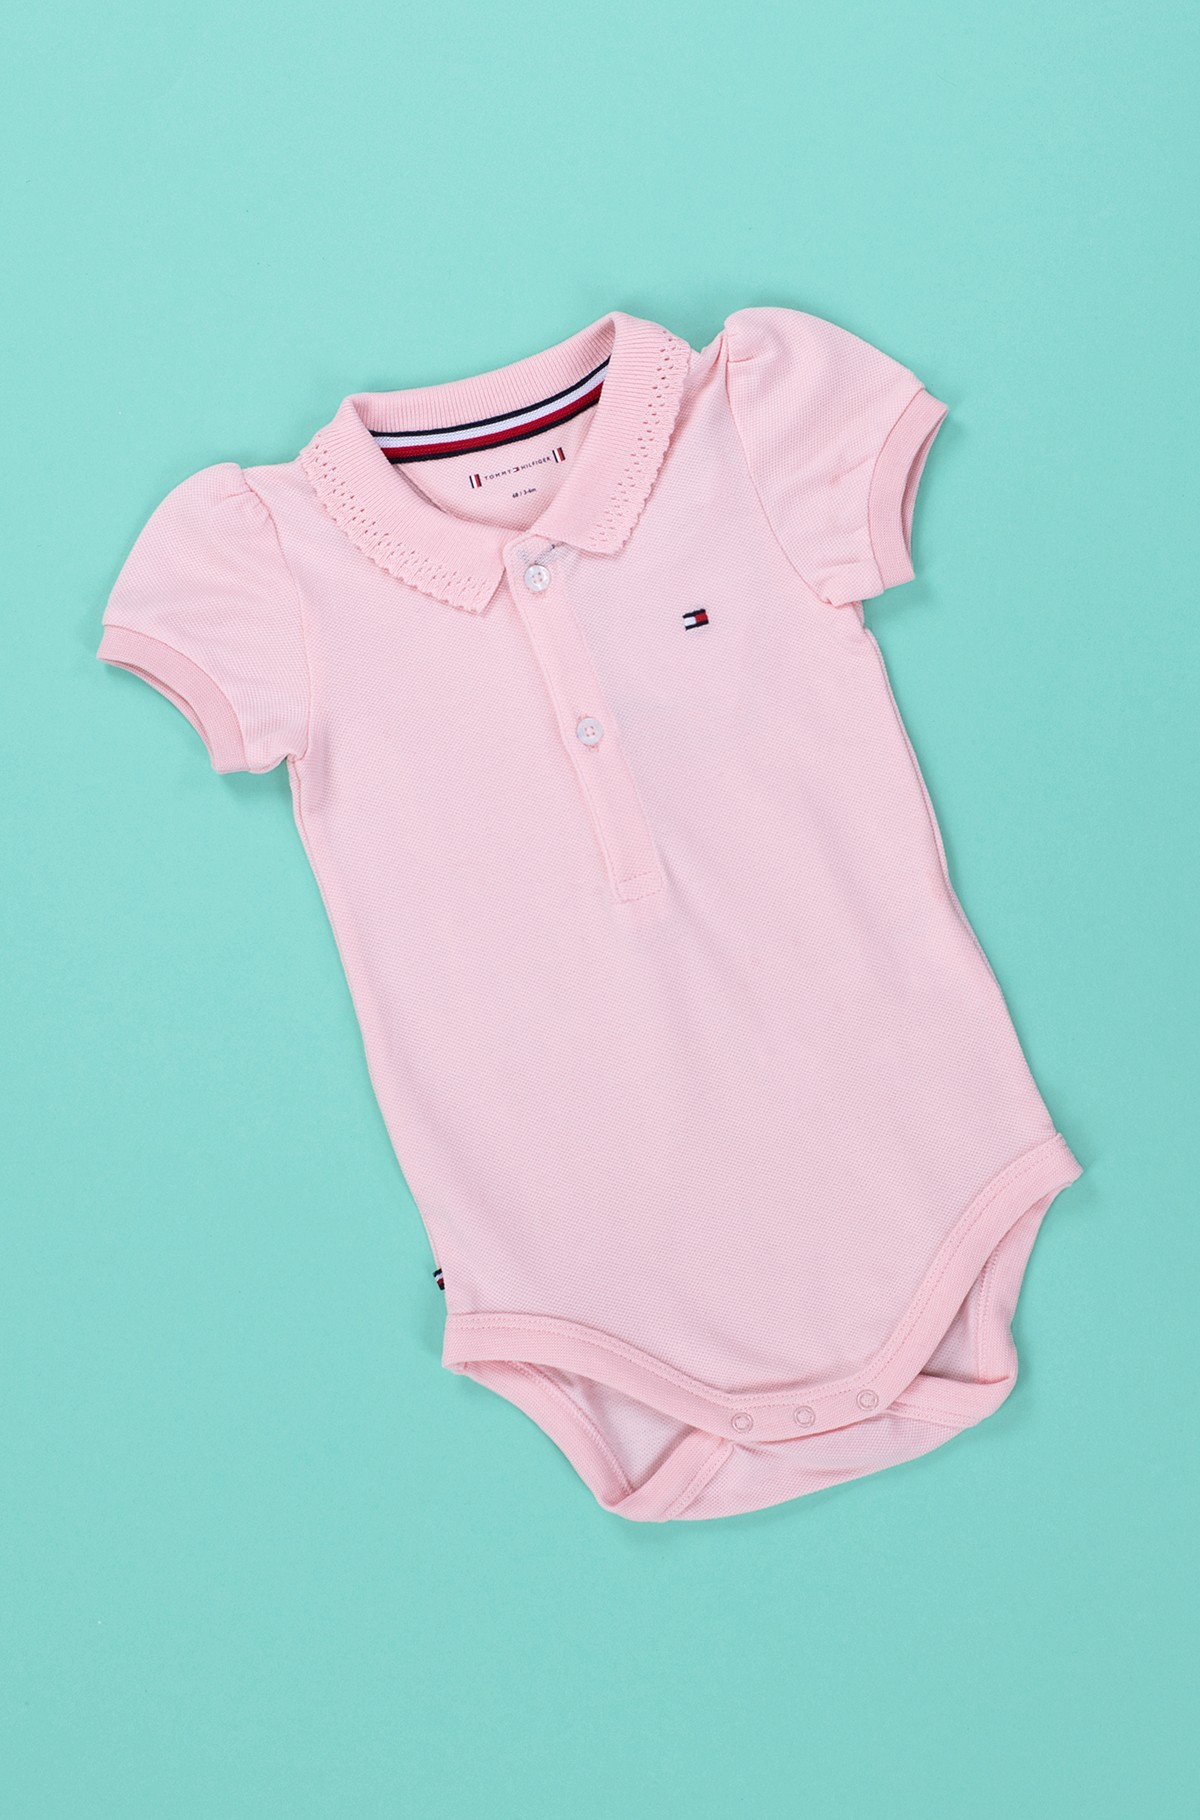 Bērna bodijs dāvanu kārbā BABY POLO BODY GIFTBOX-full-1